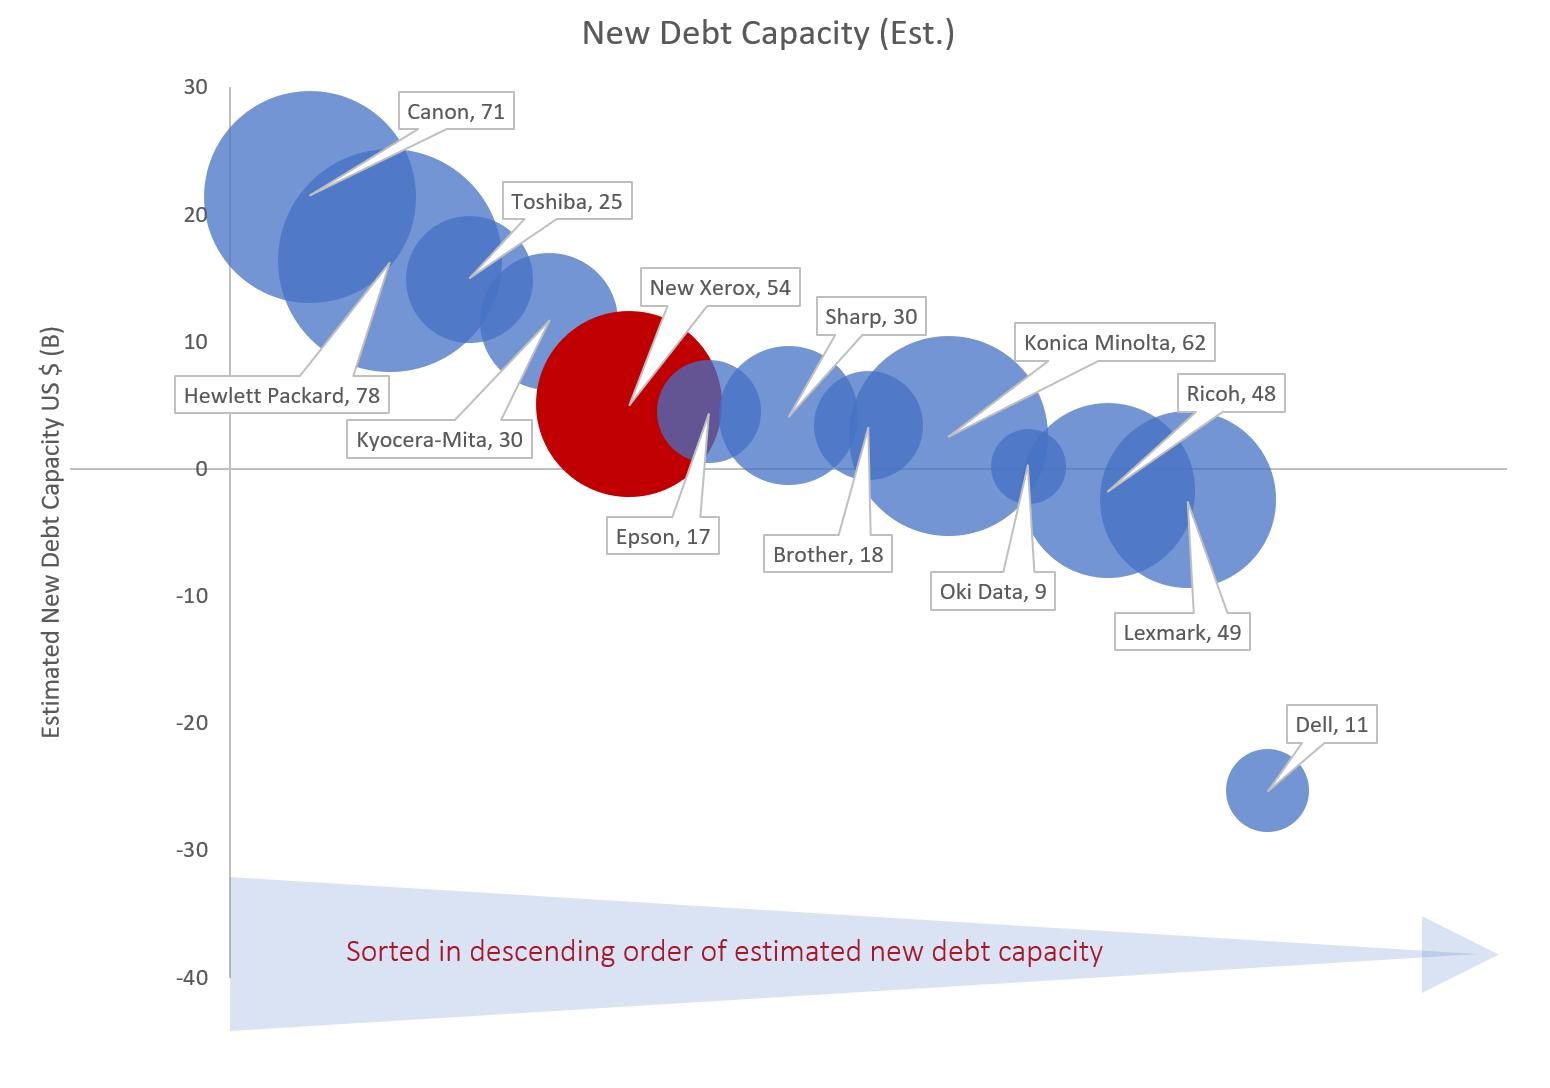 New Debt Capacity Vs. Capabilities Index_Rev 4